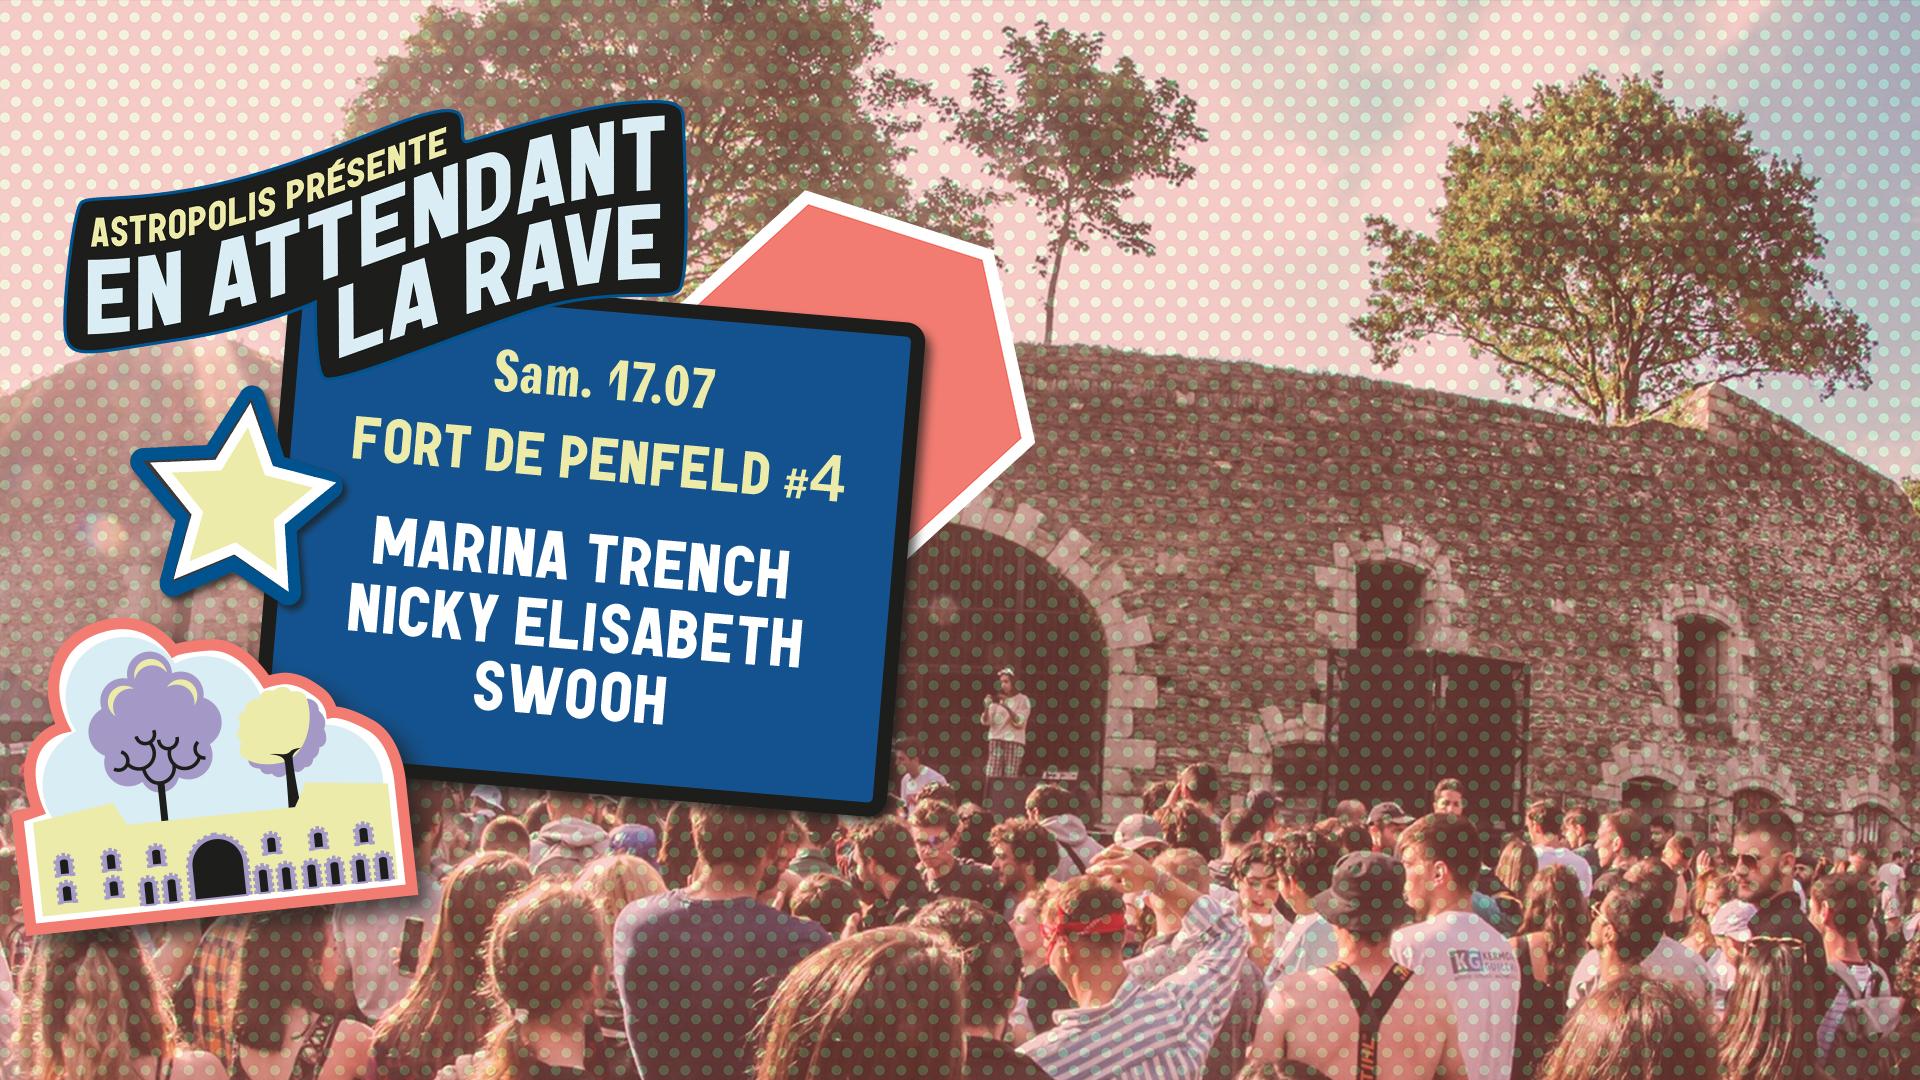 17/07 : Fort de Penfeld #4 - Marina Trench + Nicky Elisabeth + Swooh